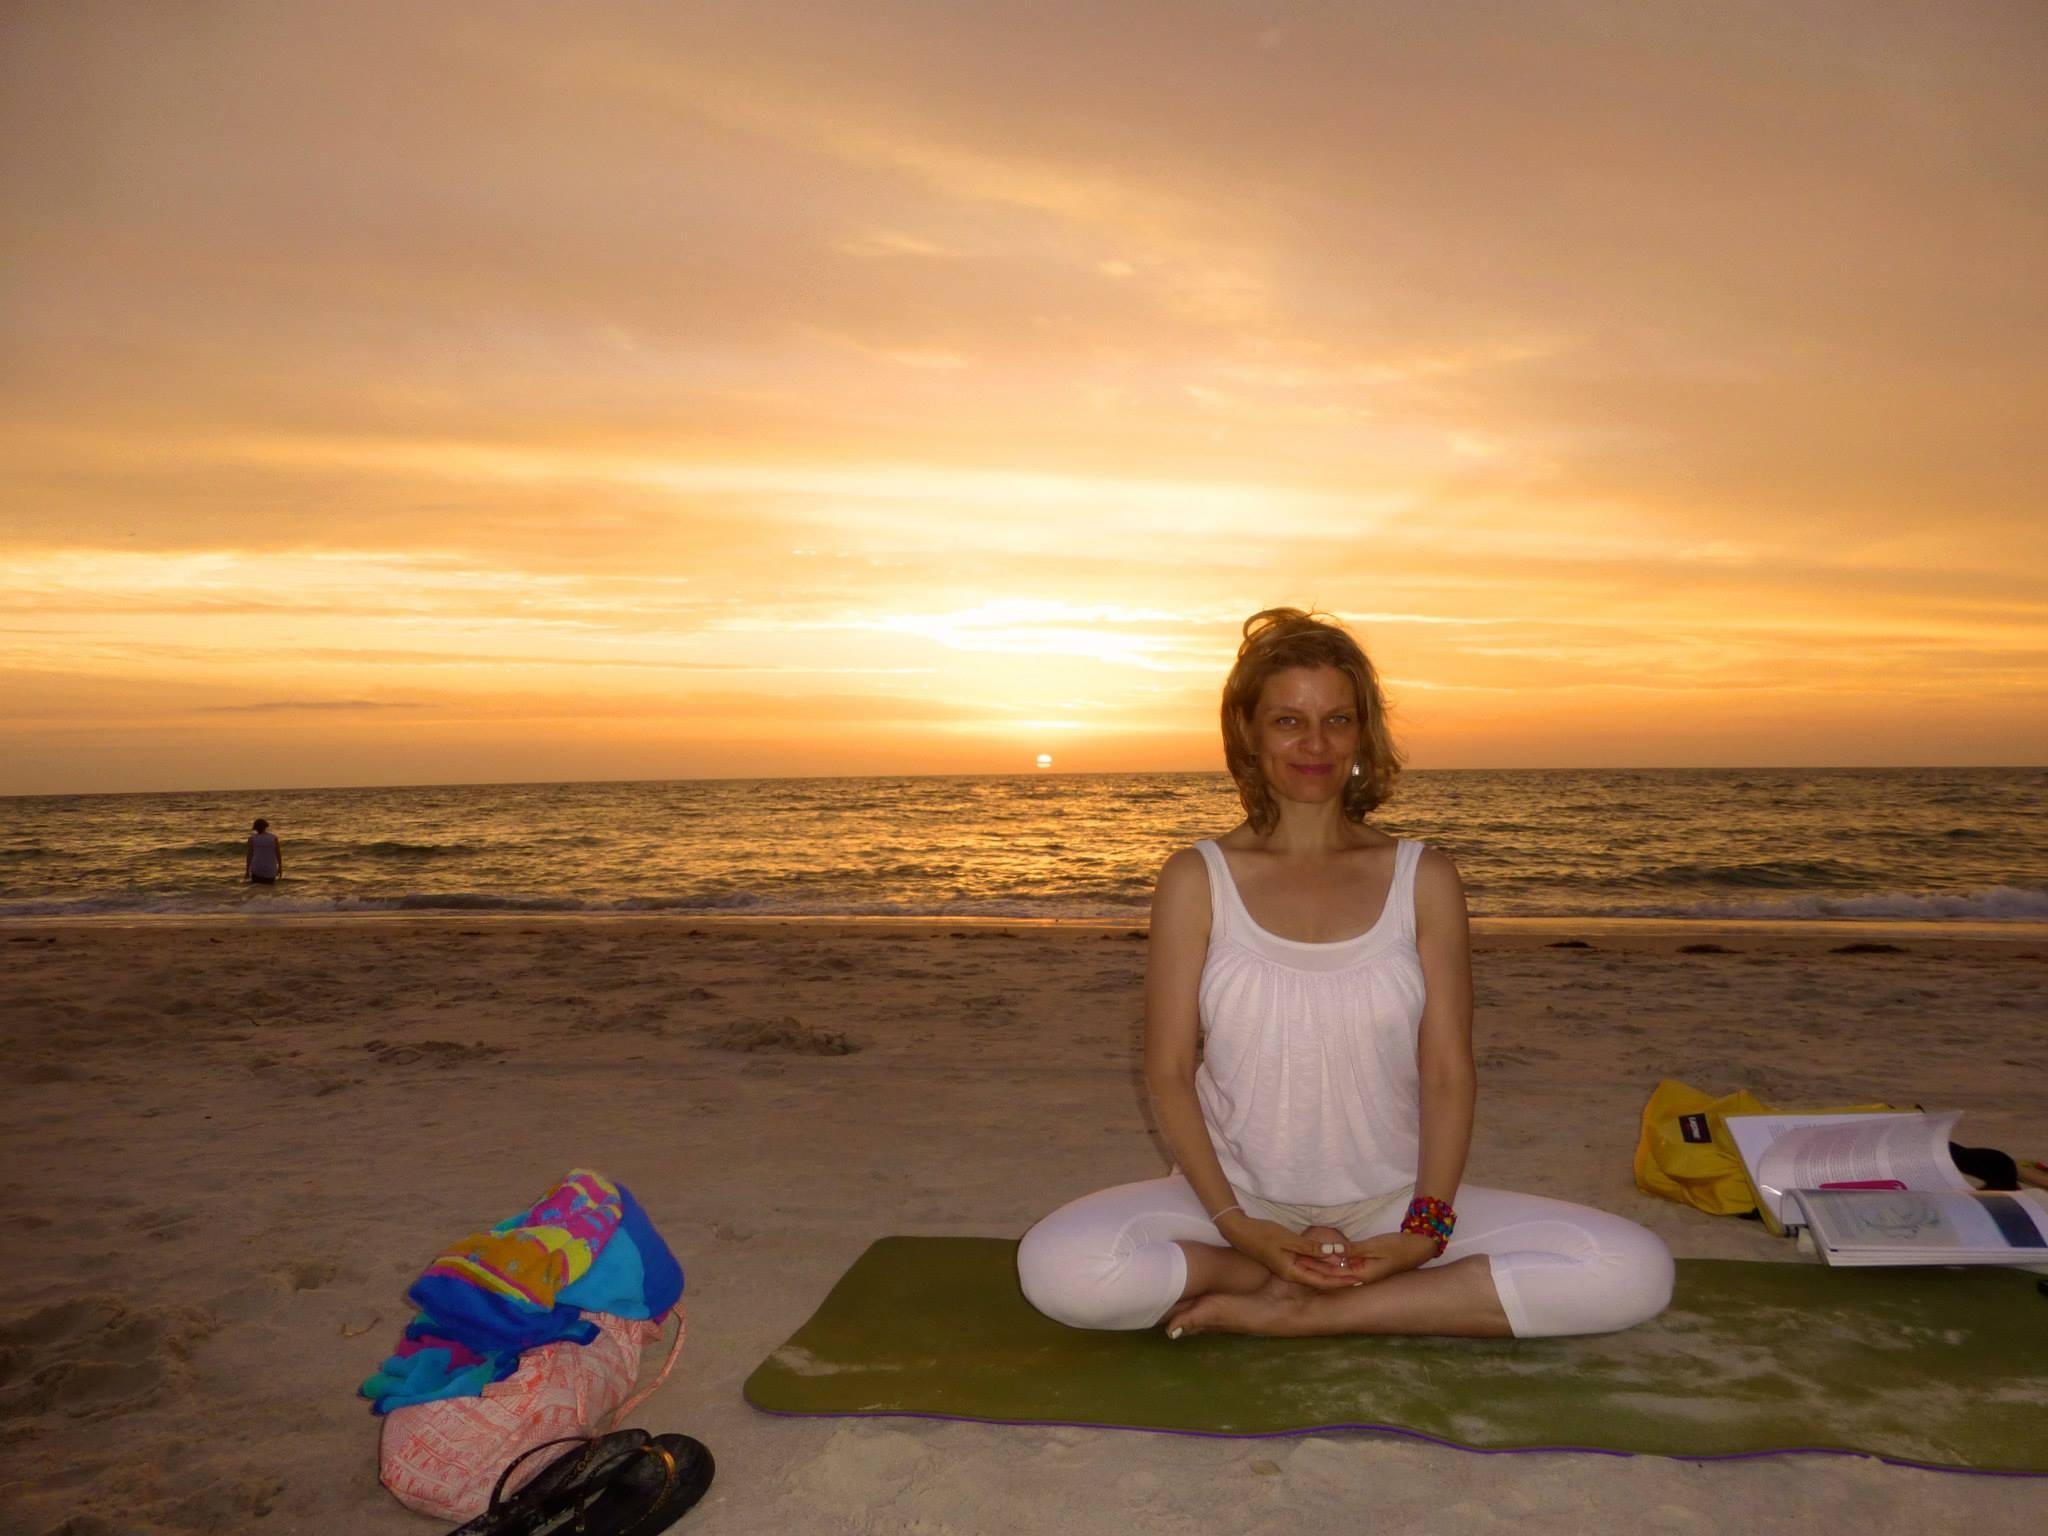 Beach kundalini yoga .. total and utter magic!